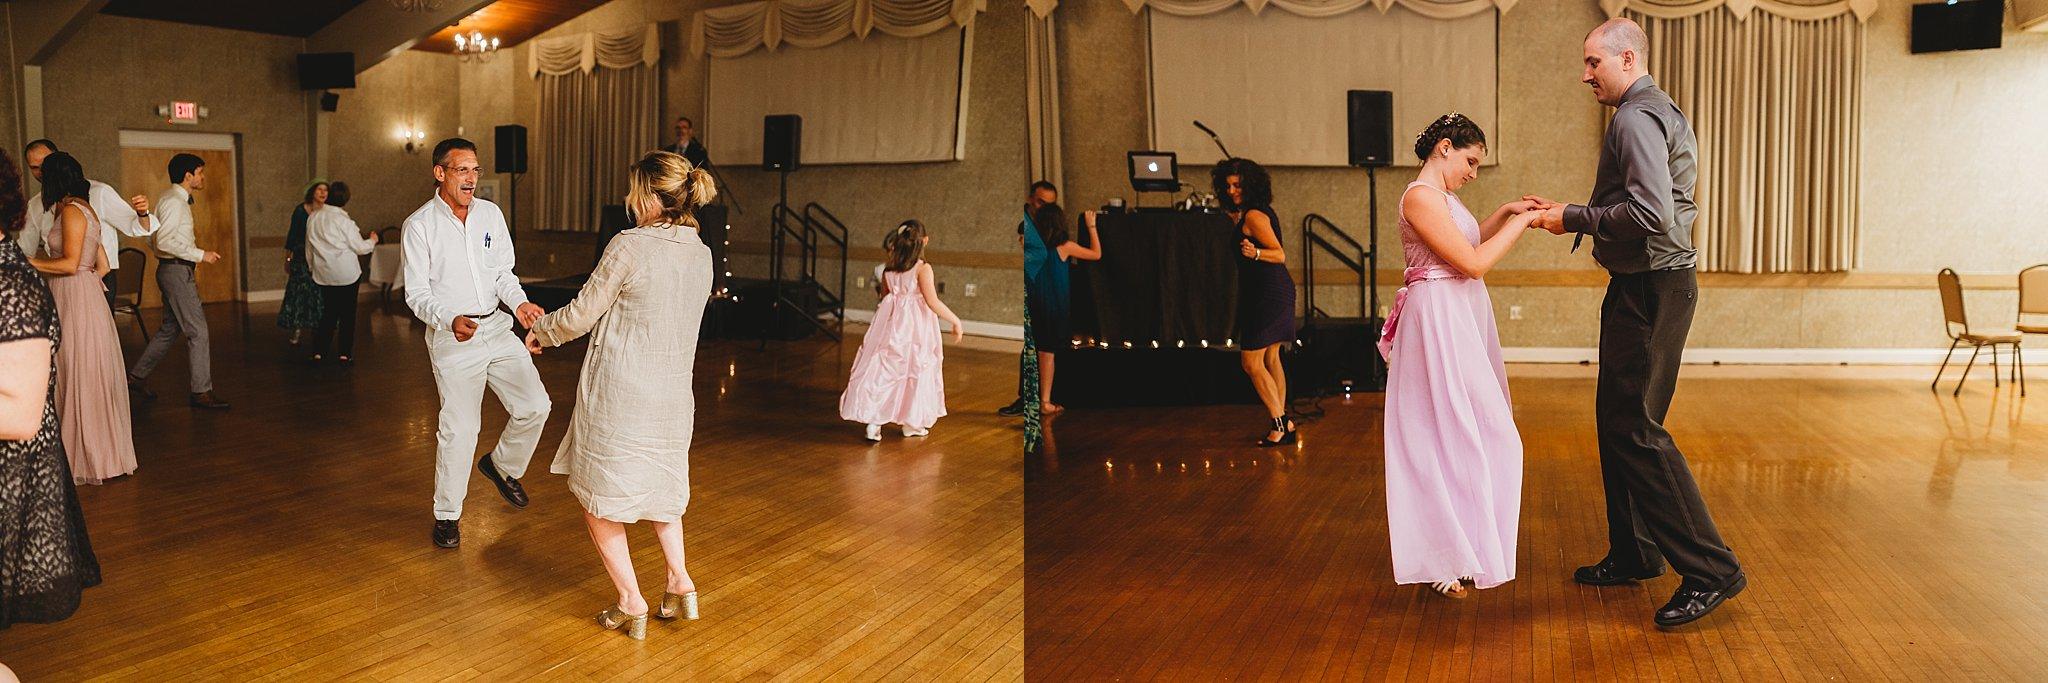 Gumlaw_Wedding_0103.jpg